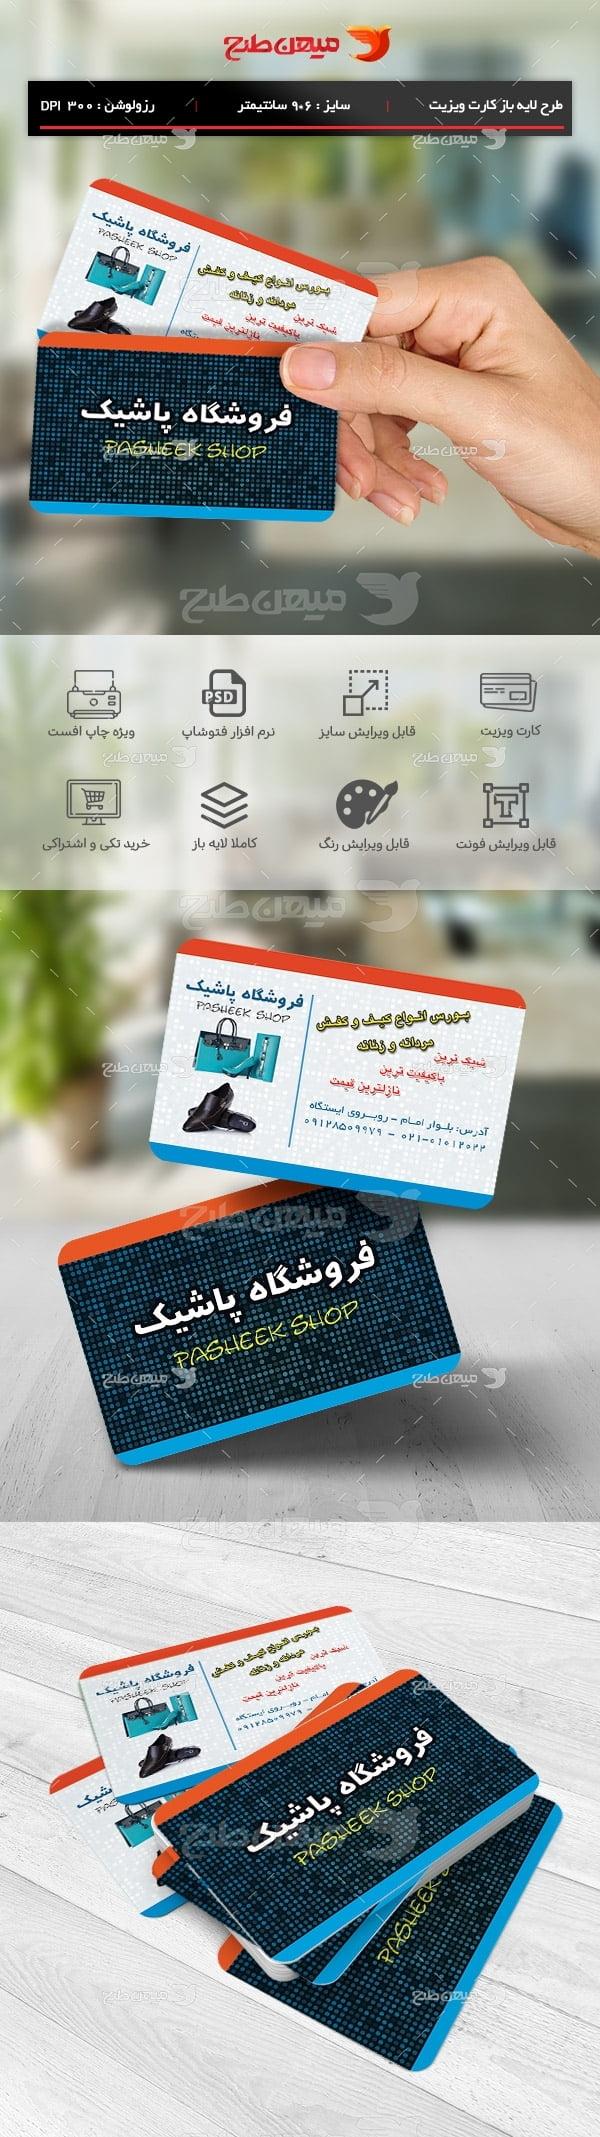 طرح کارت ویزیت فروشگاه کیف و کفش پاشیک